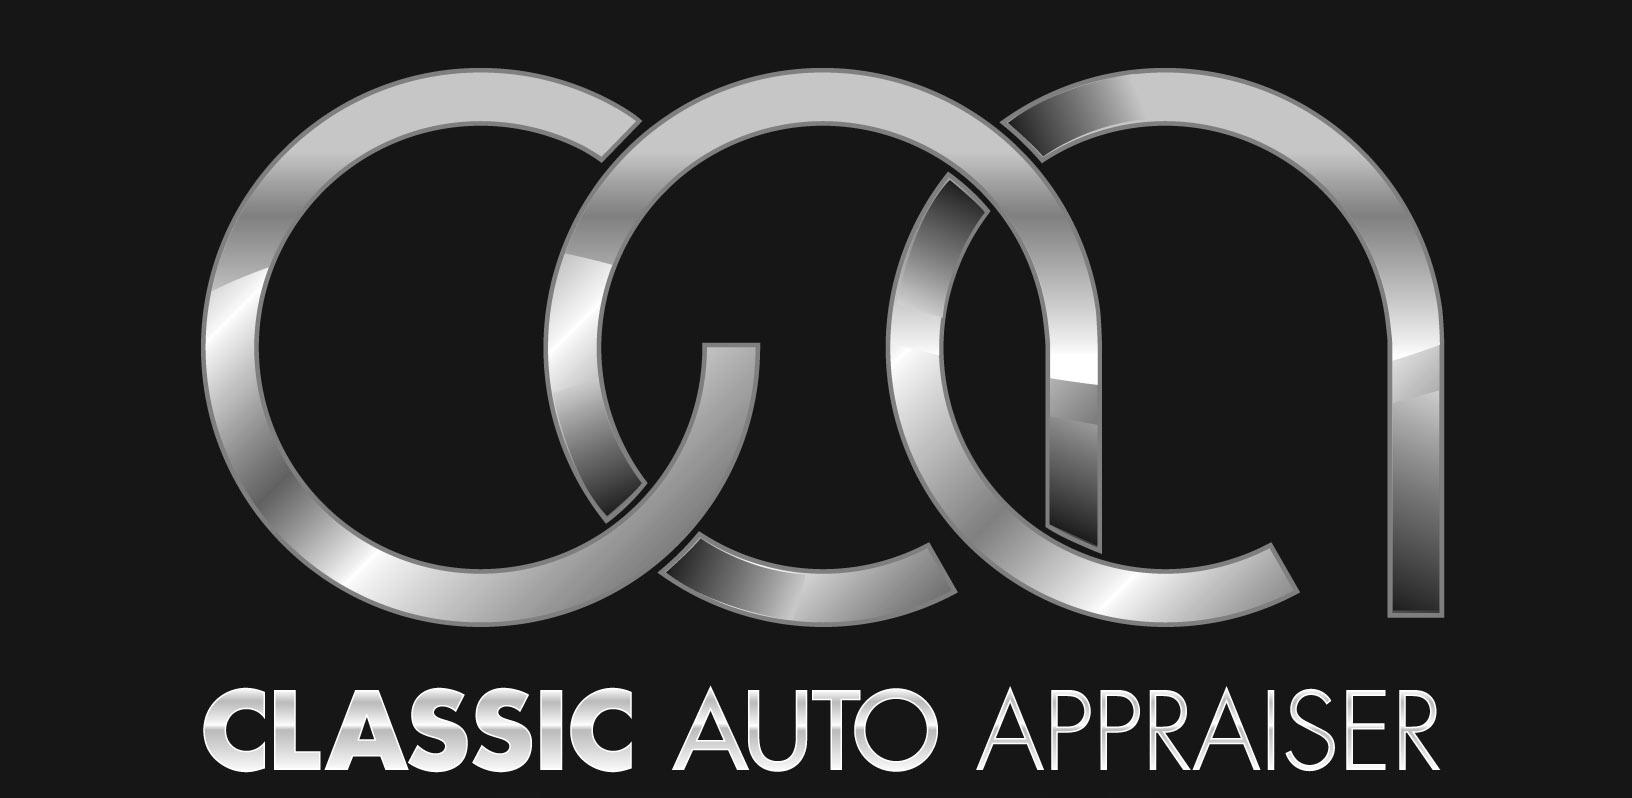 Classic Auto Appraiser